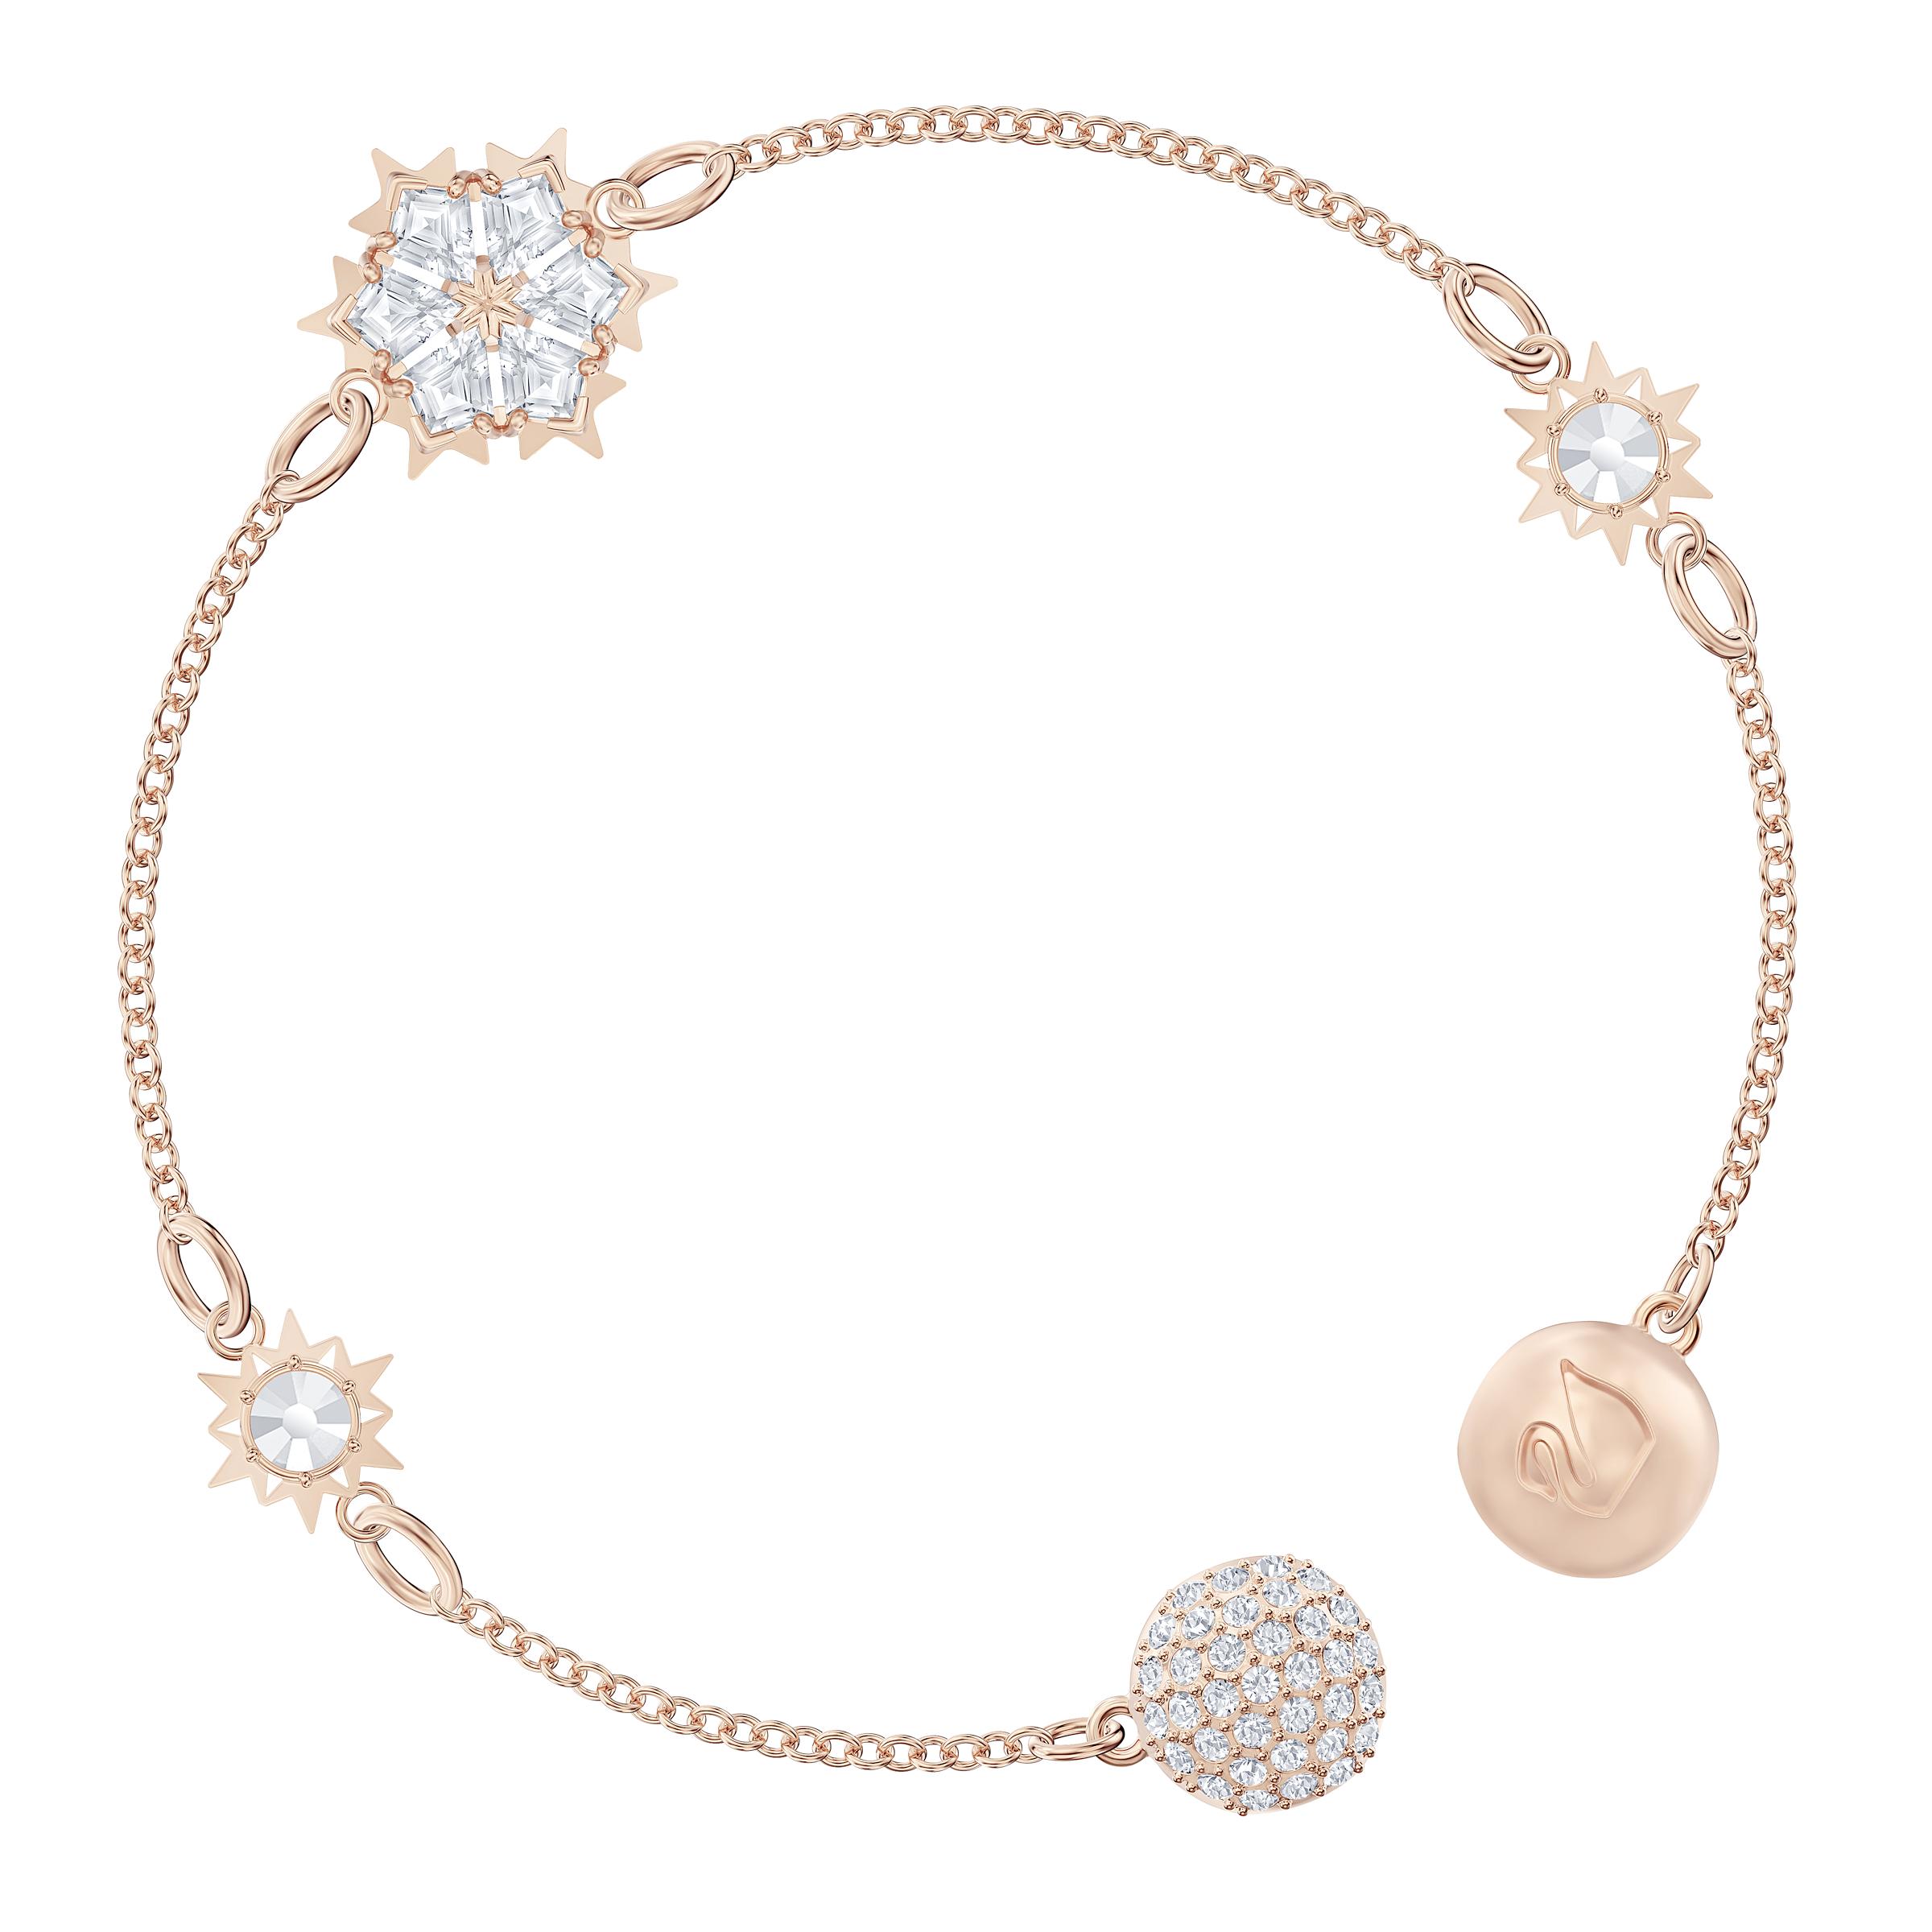 Swarovski Remix Collection Snowflake Strand, White, Rose-gold tone plated